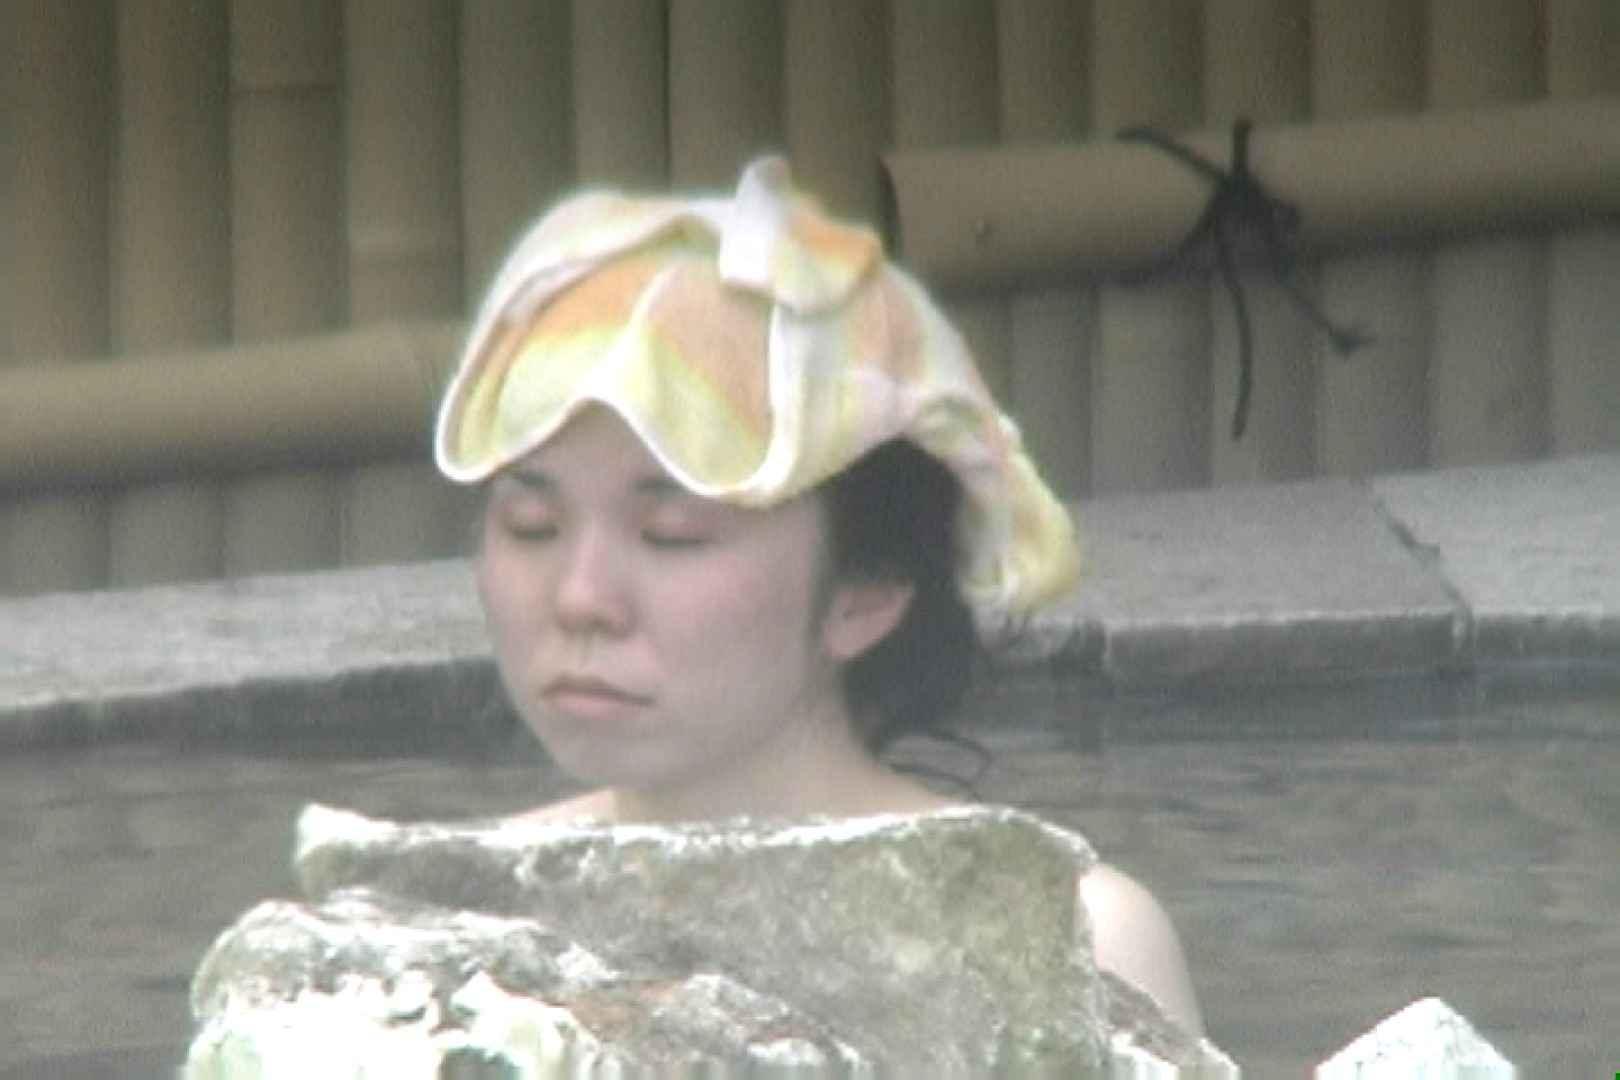 Aquaな露天風呂Vol.687 盗撮   OLセックス  63画像 37